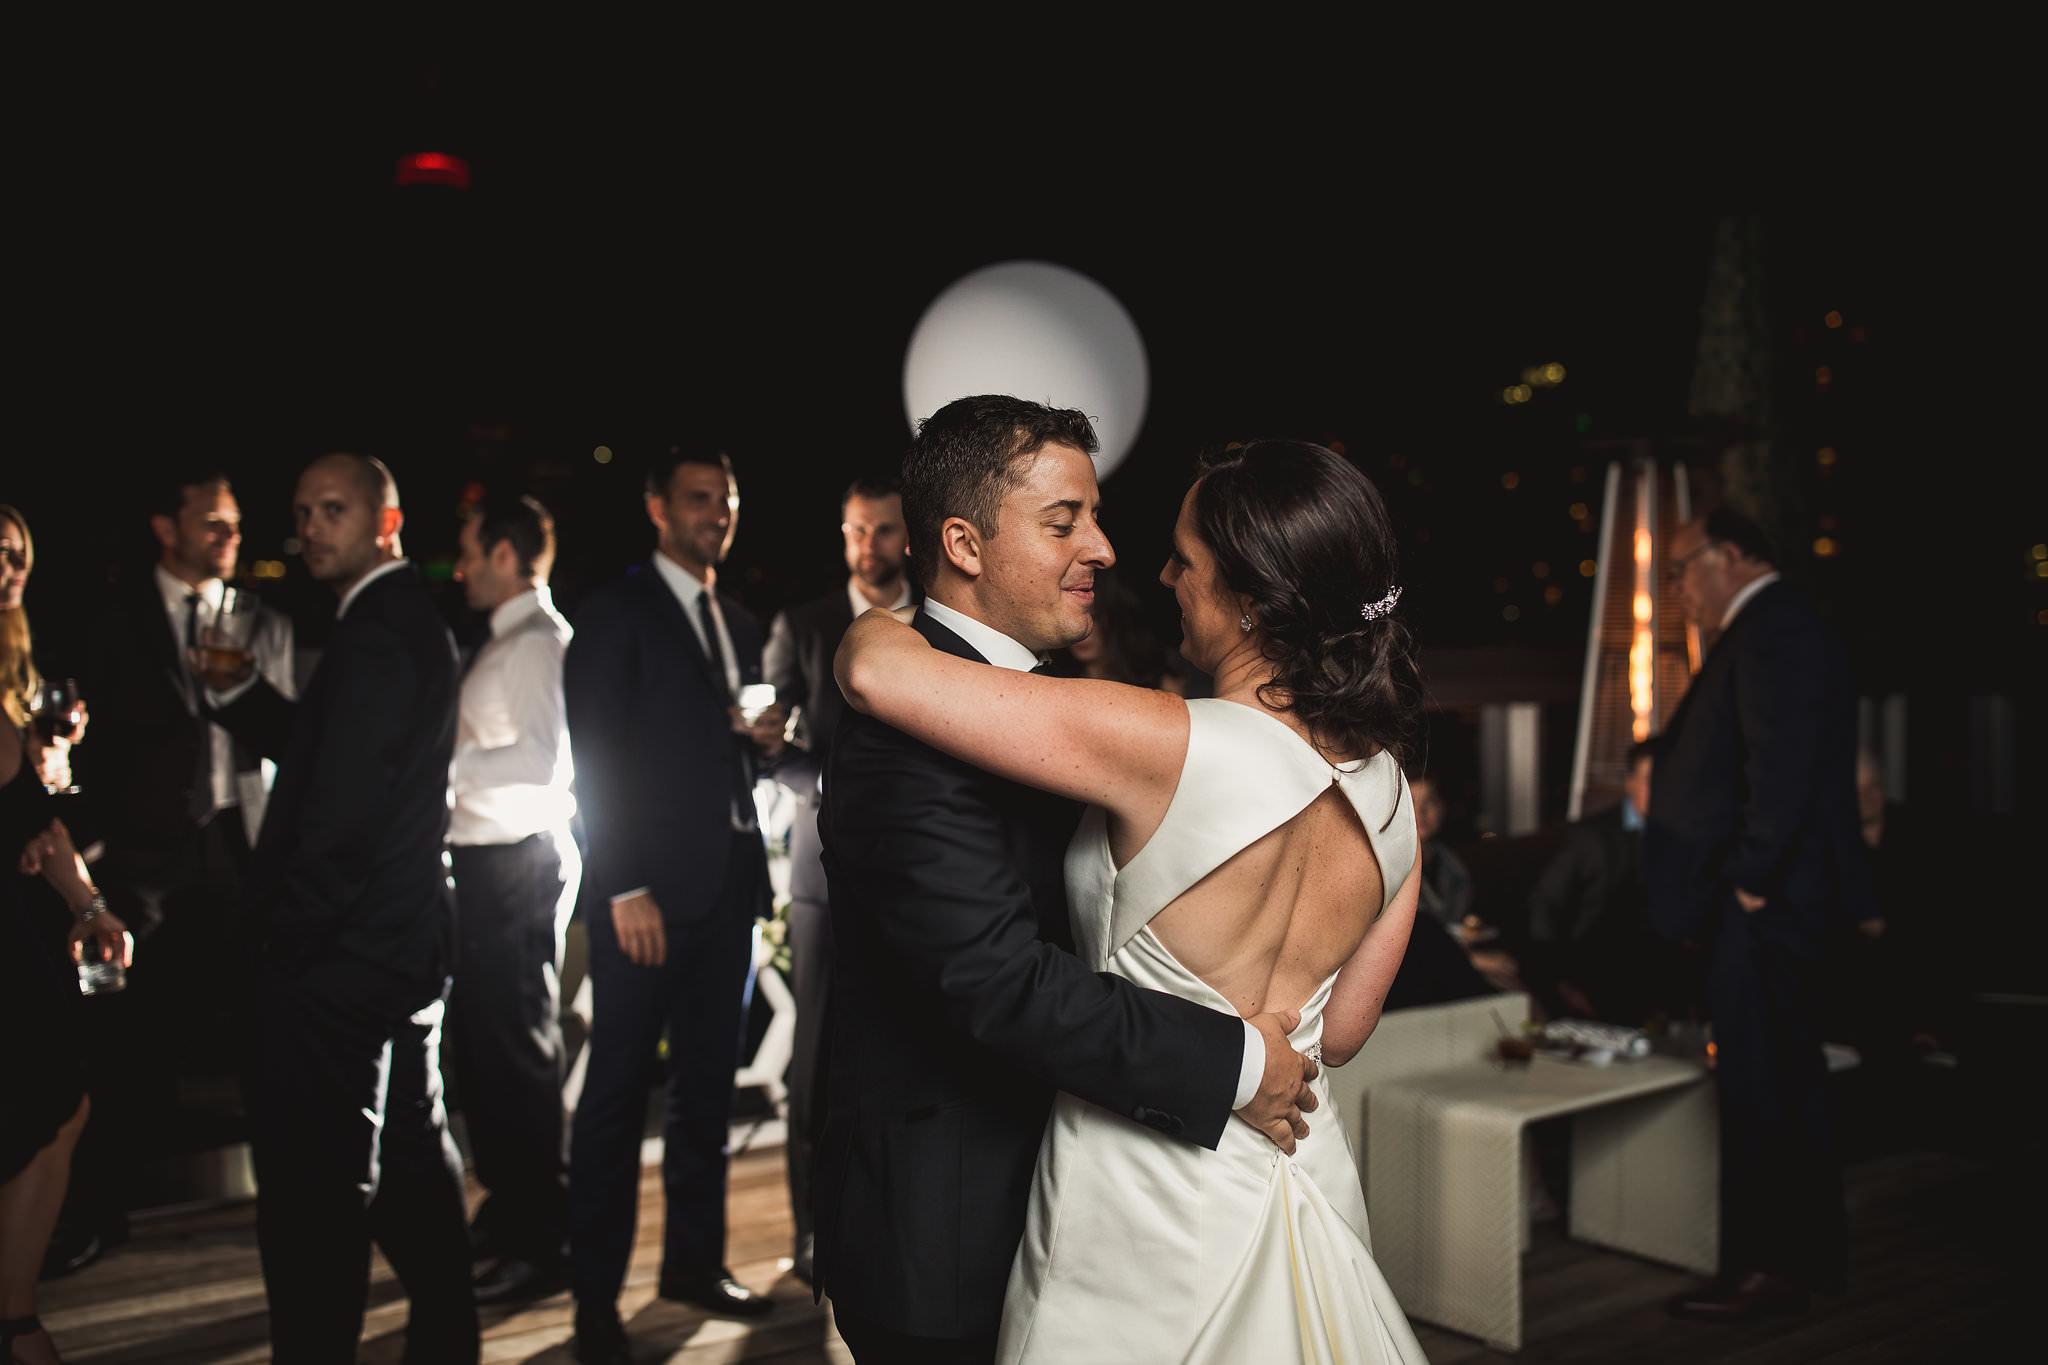 Cristin Rob Thompson Hotel Wedding Photos 683 - Thompson Hotel Wedding Photos